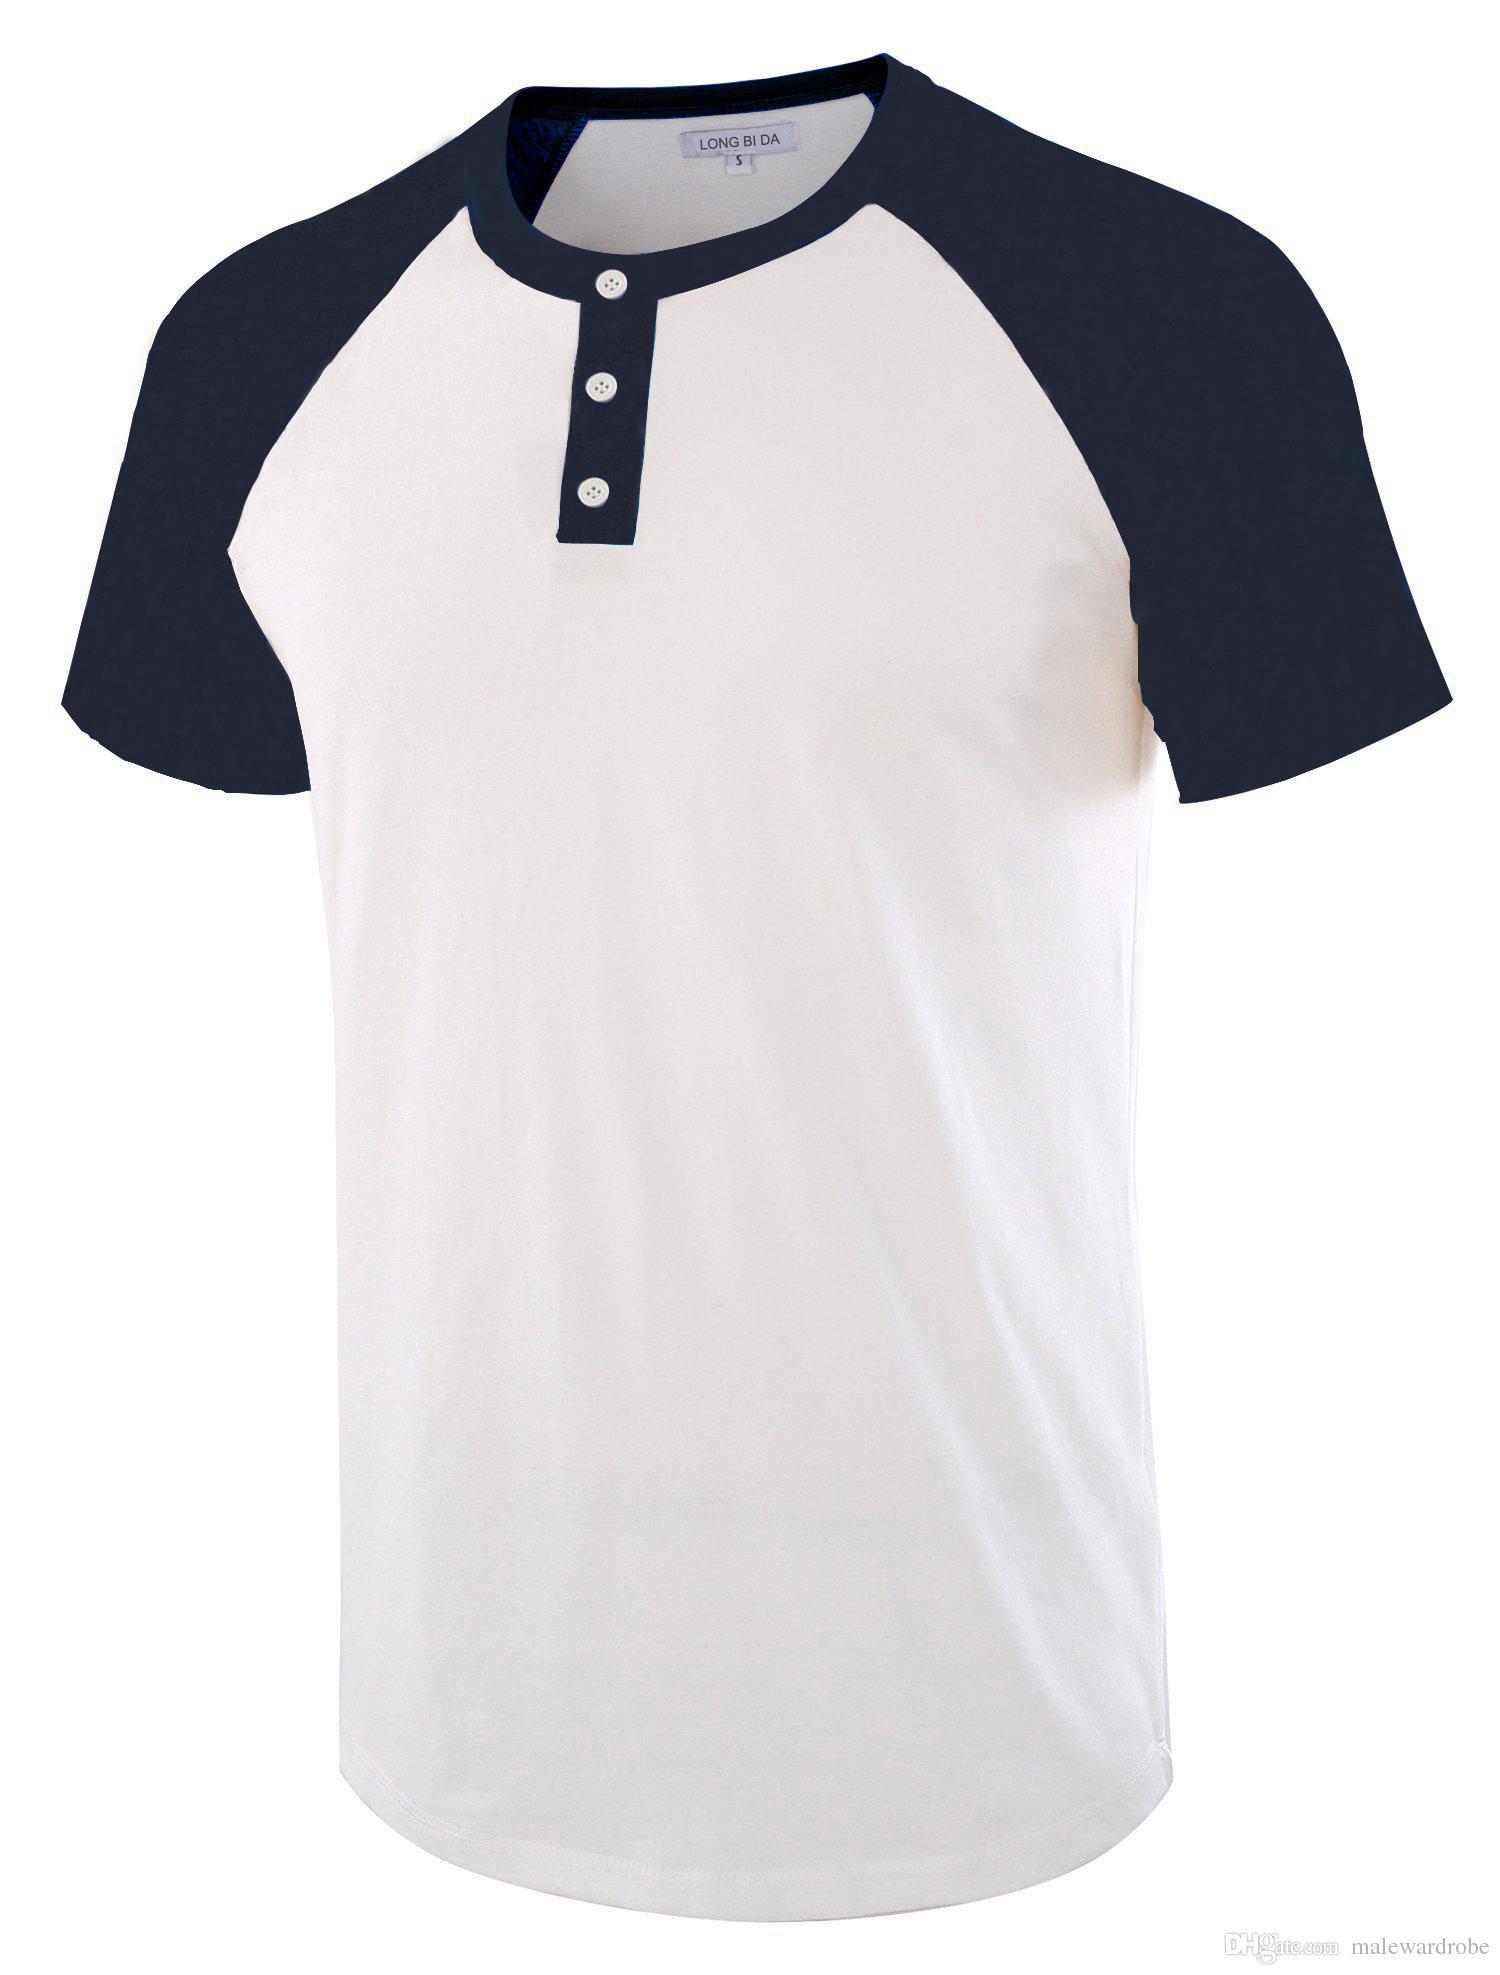 88e728e4b Compre Diseño De Botones Camisetas Casual Para Hombre Verano Mezcla De  Algodón De Manga Corta Camisetas Cuello Redondo Remiendo Camisetas Hommes  Tops A ...